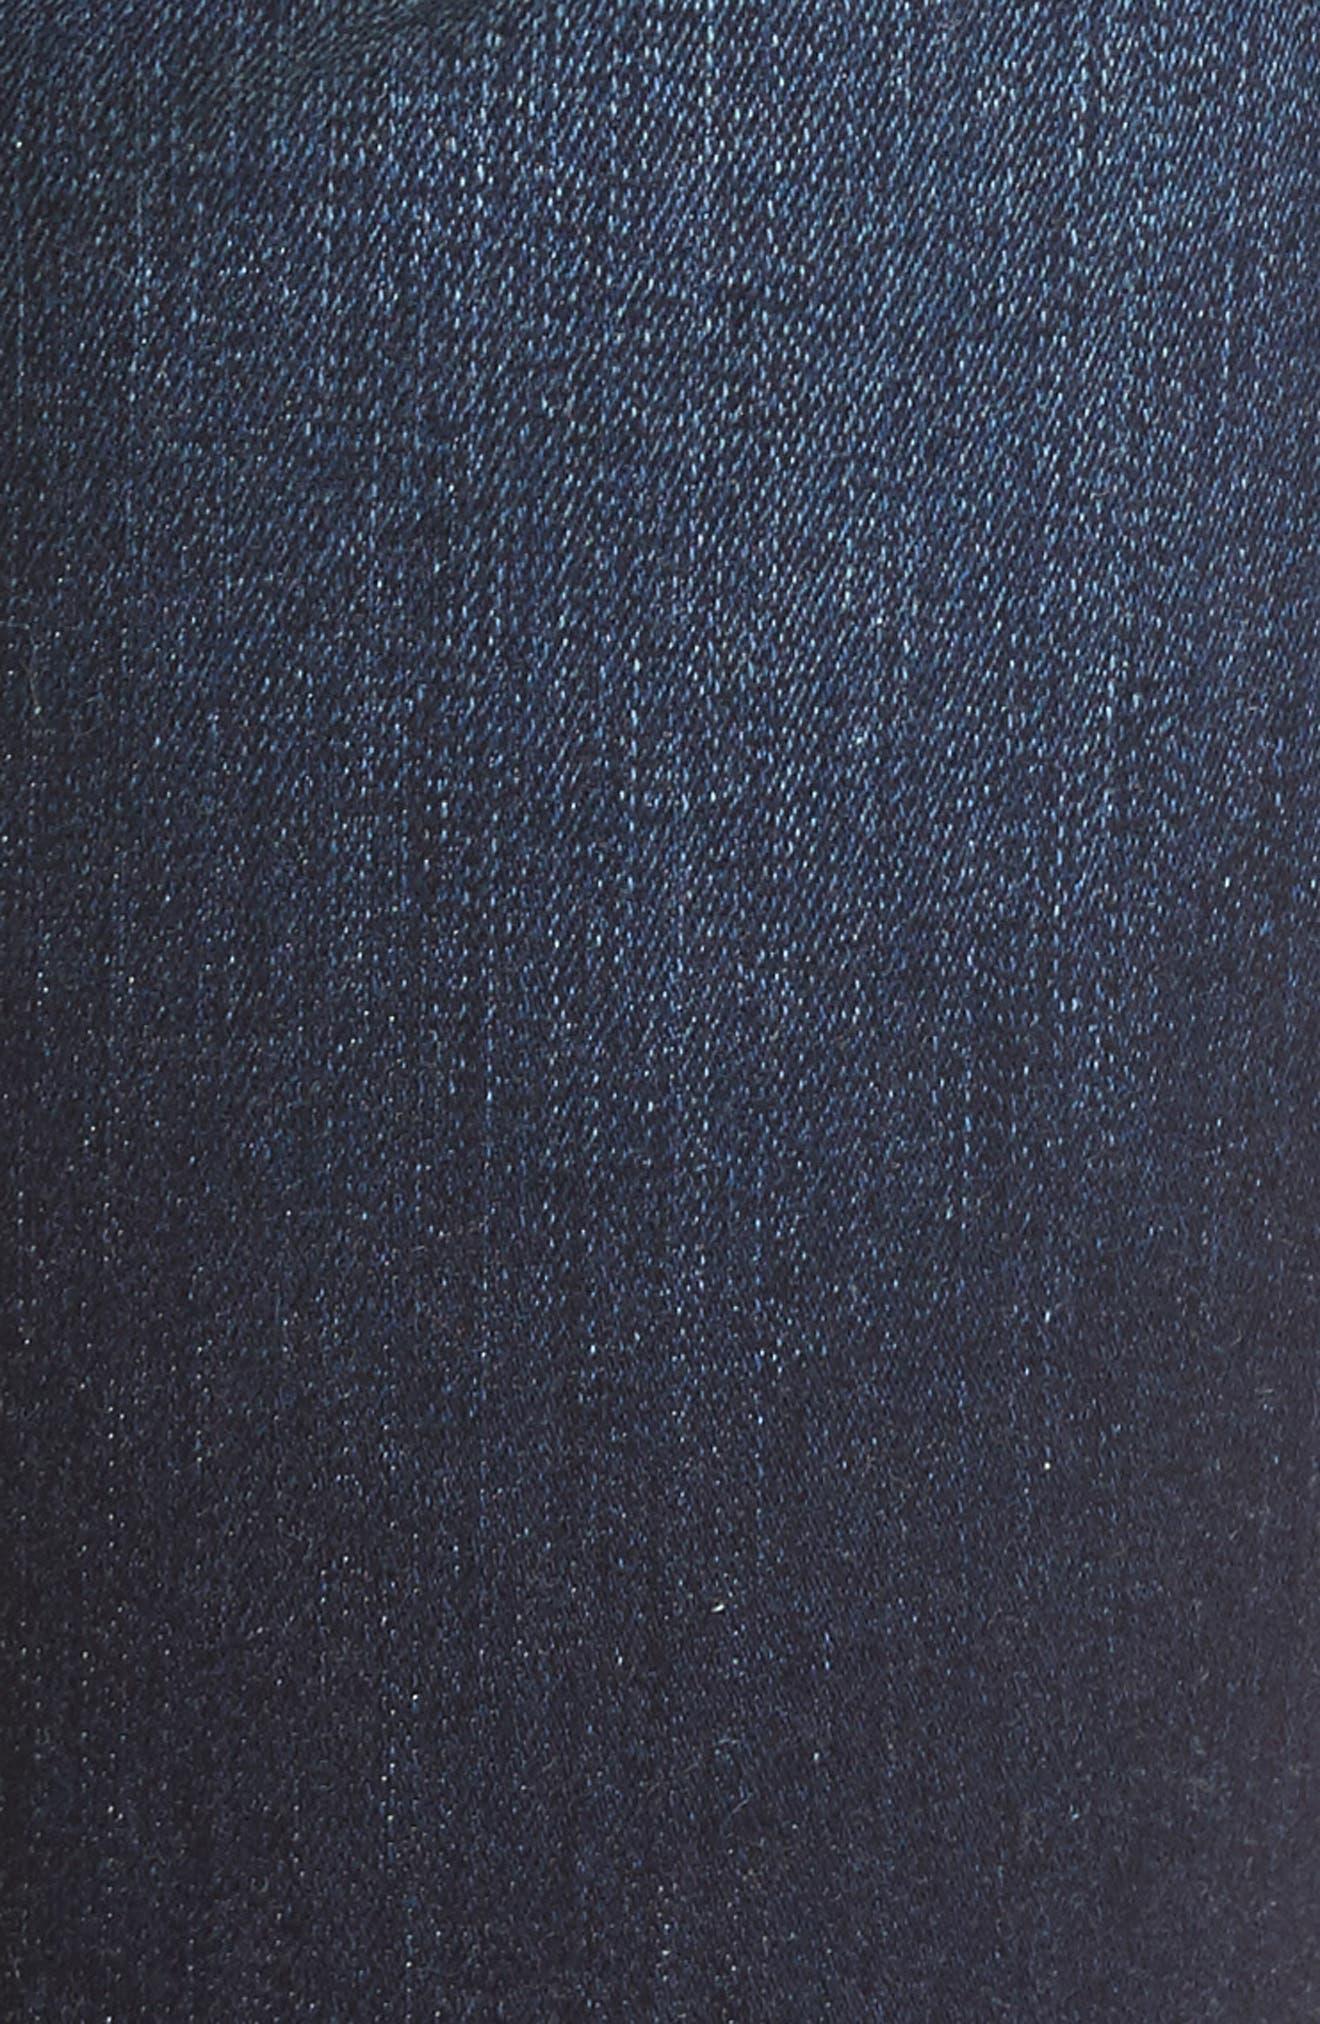 Alina Release Hem Stretch Ankle Jeans,                             Alternate thumbnail 5, color,                             421